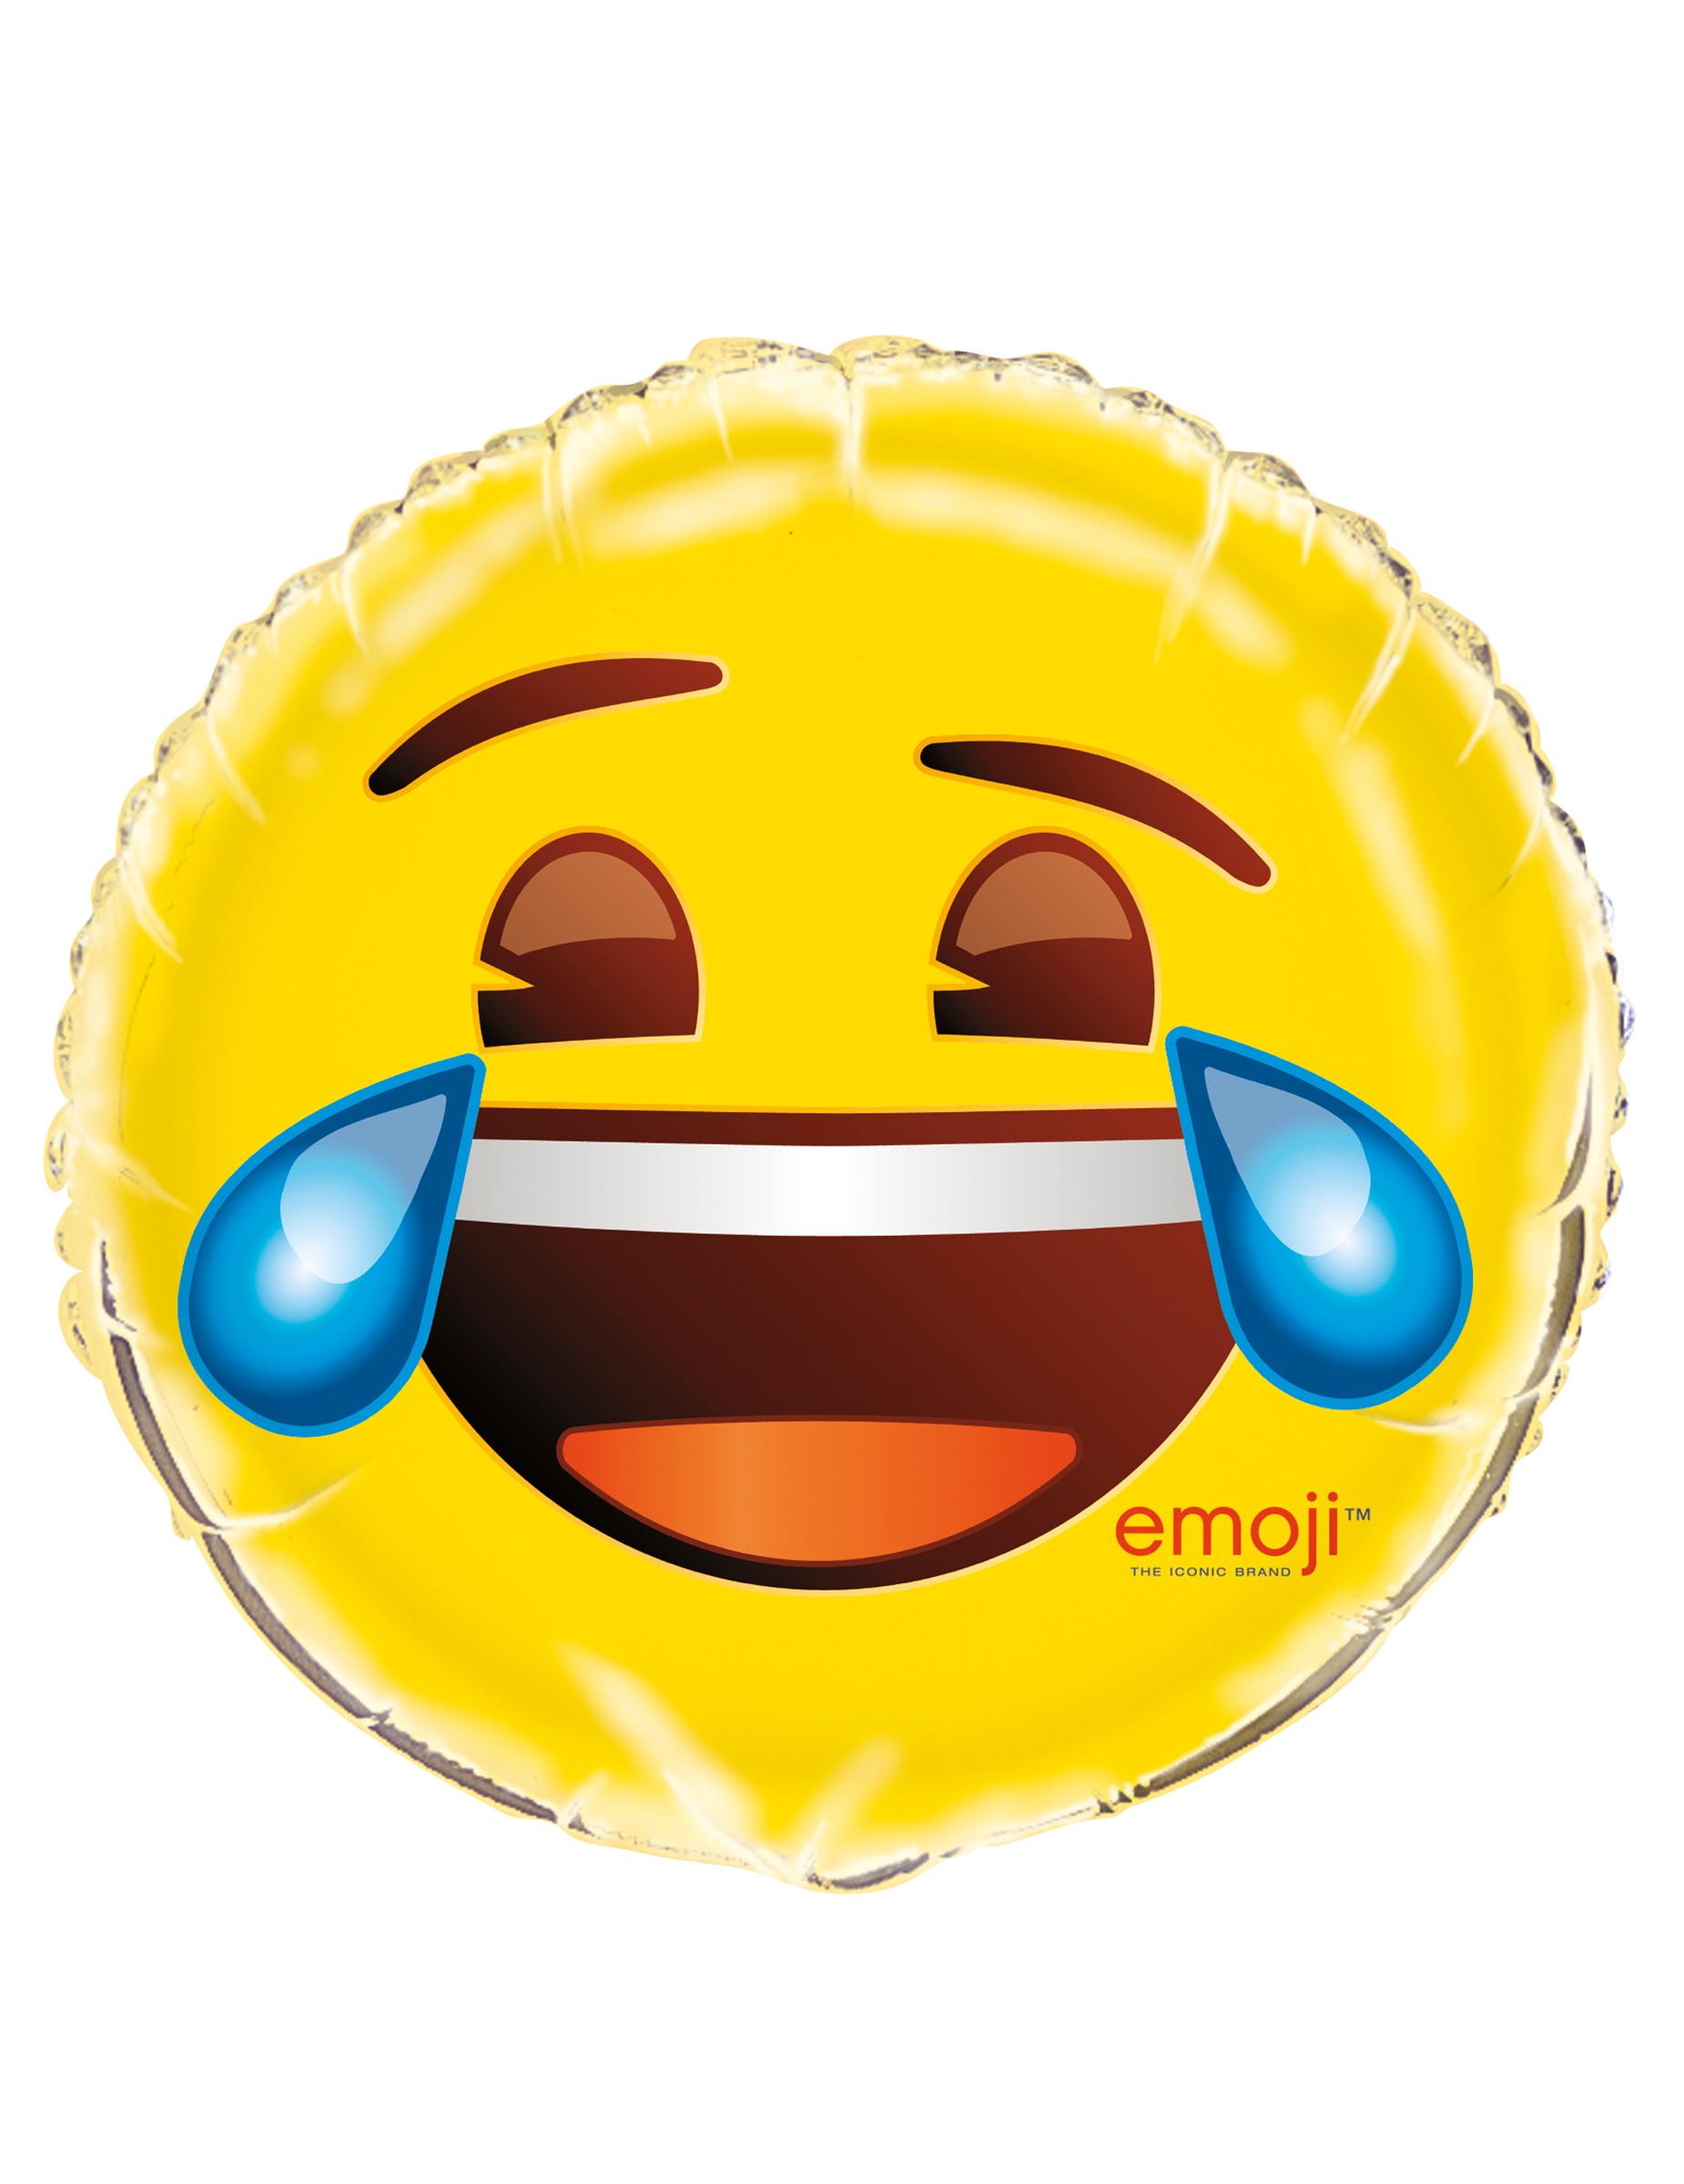 Emoji Aluminiumballon Lachendes Gesicht Gunstige Faschings